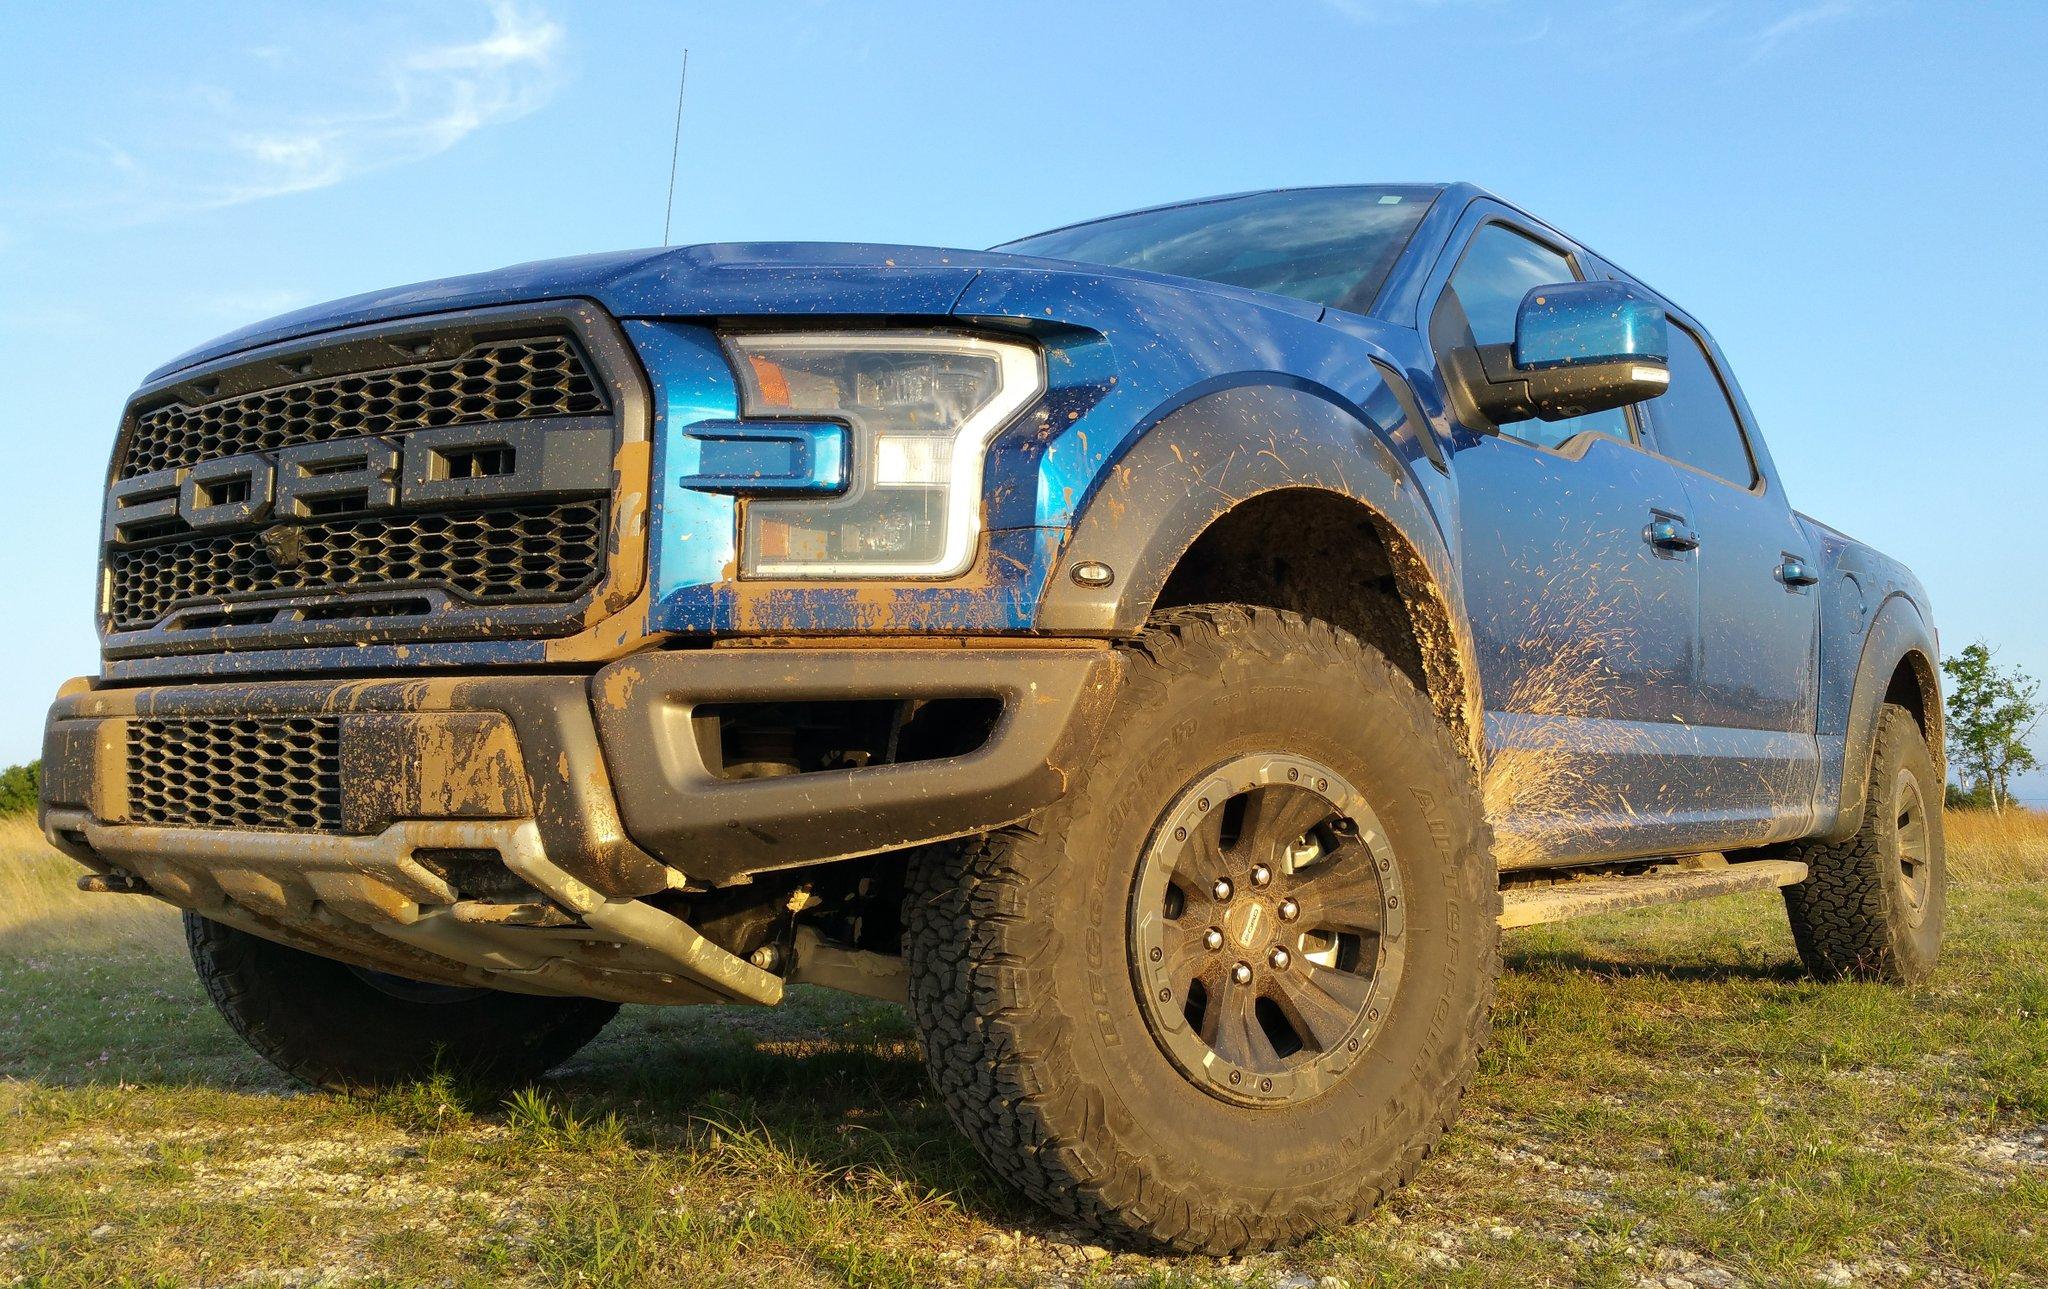 We get down & dirty tonight on #Motorama LIVE @ 9PM ET w/a 2017 @Ford #Raptor report & our #RaptorVsRaptor showdown! https://t.co/ADkbp2TTqi